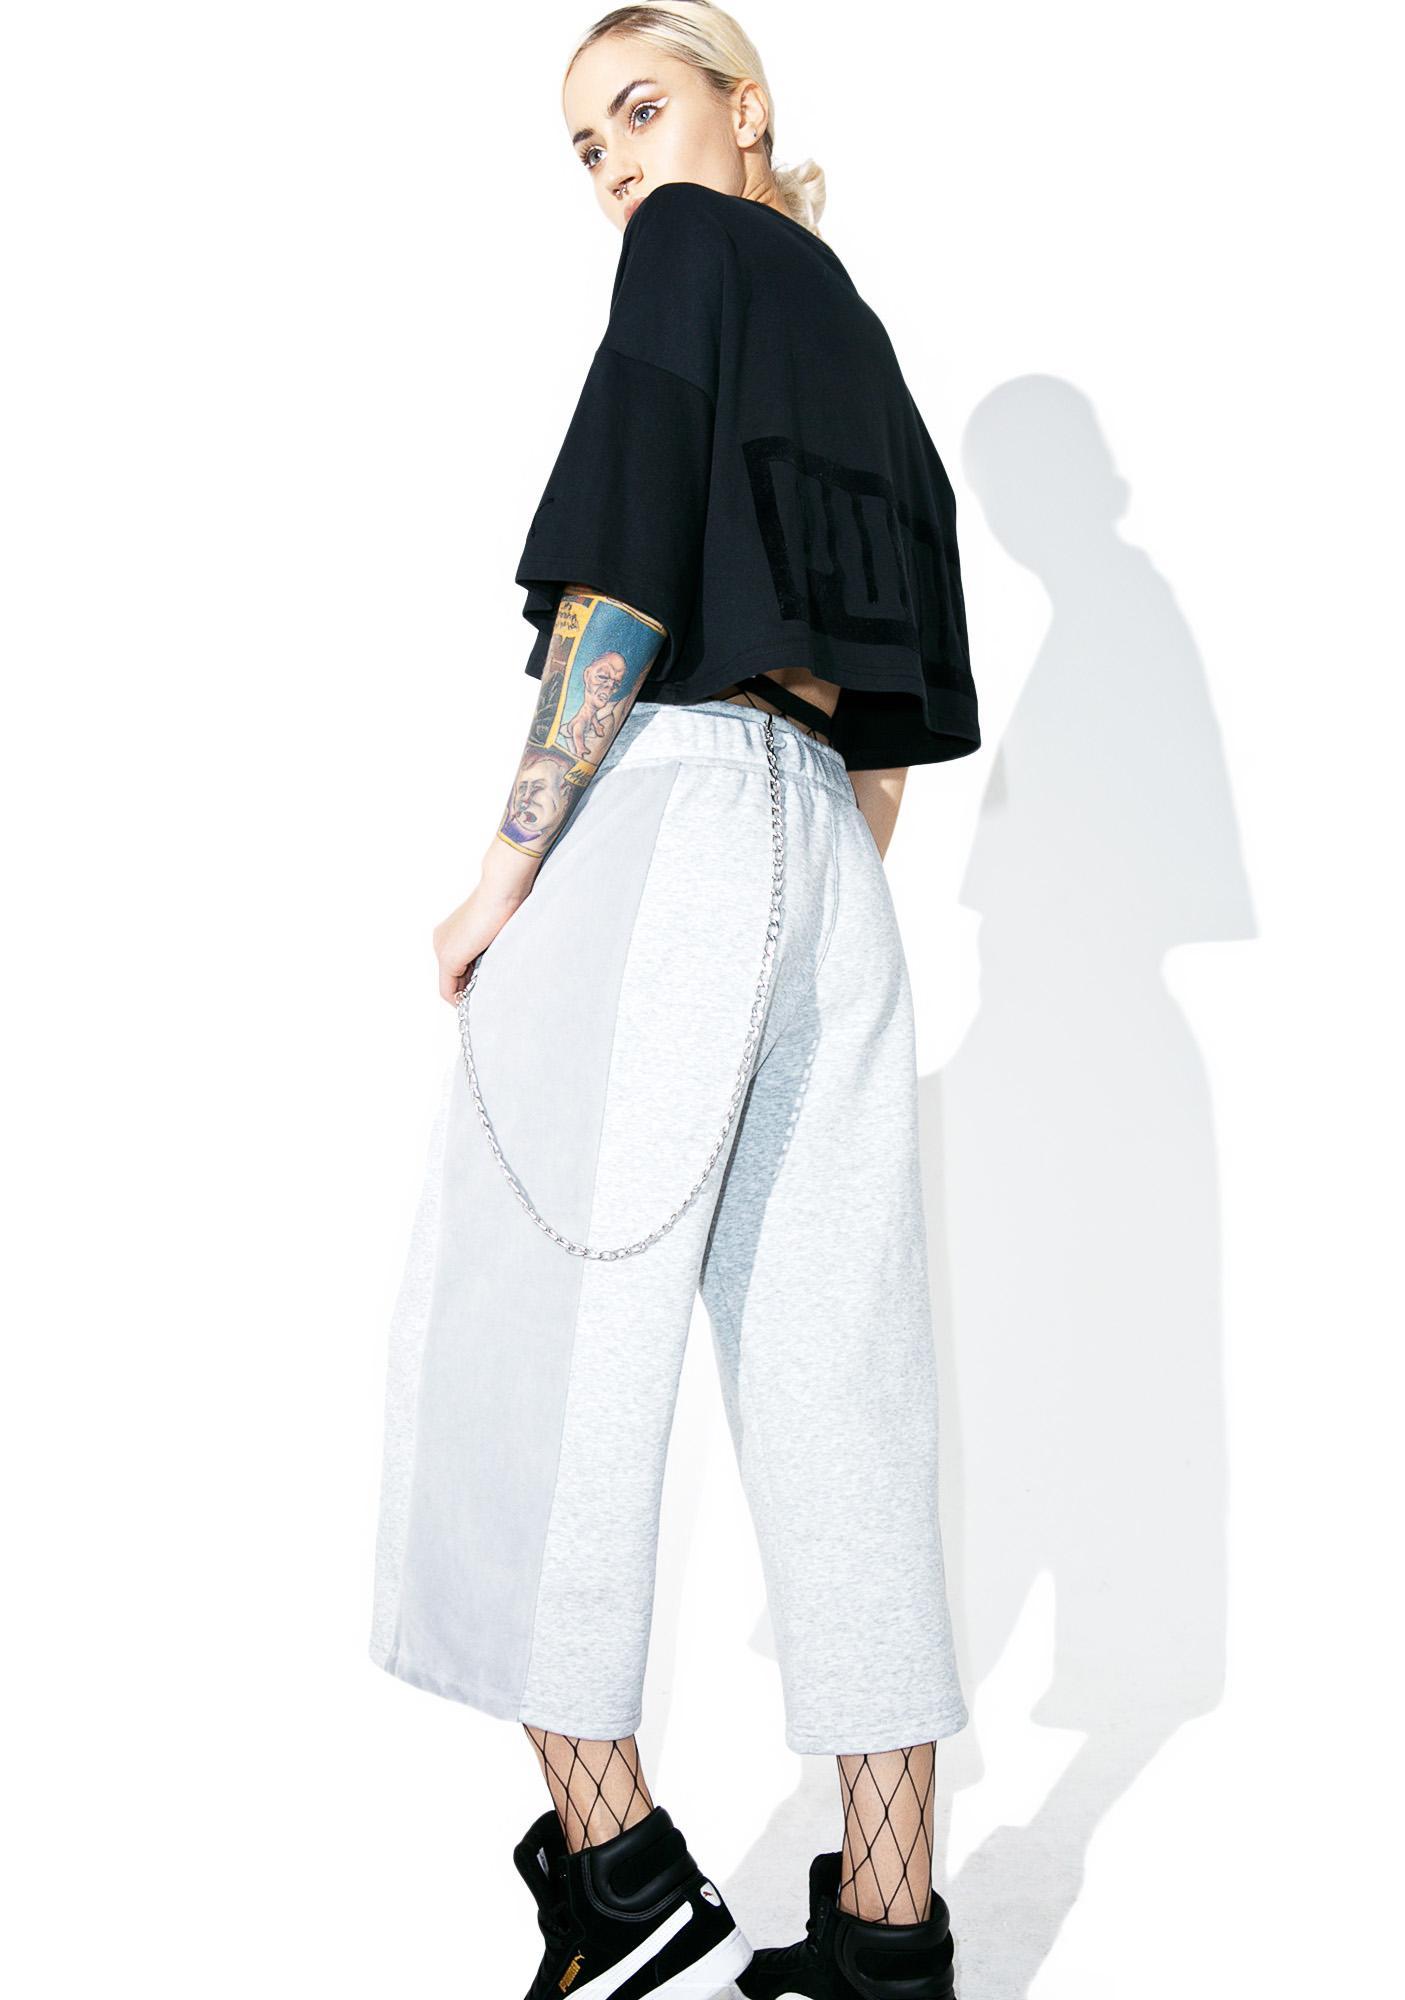 PUMA Xtreme Baggy Pants